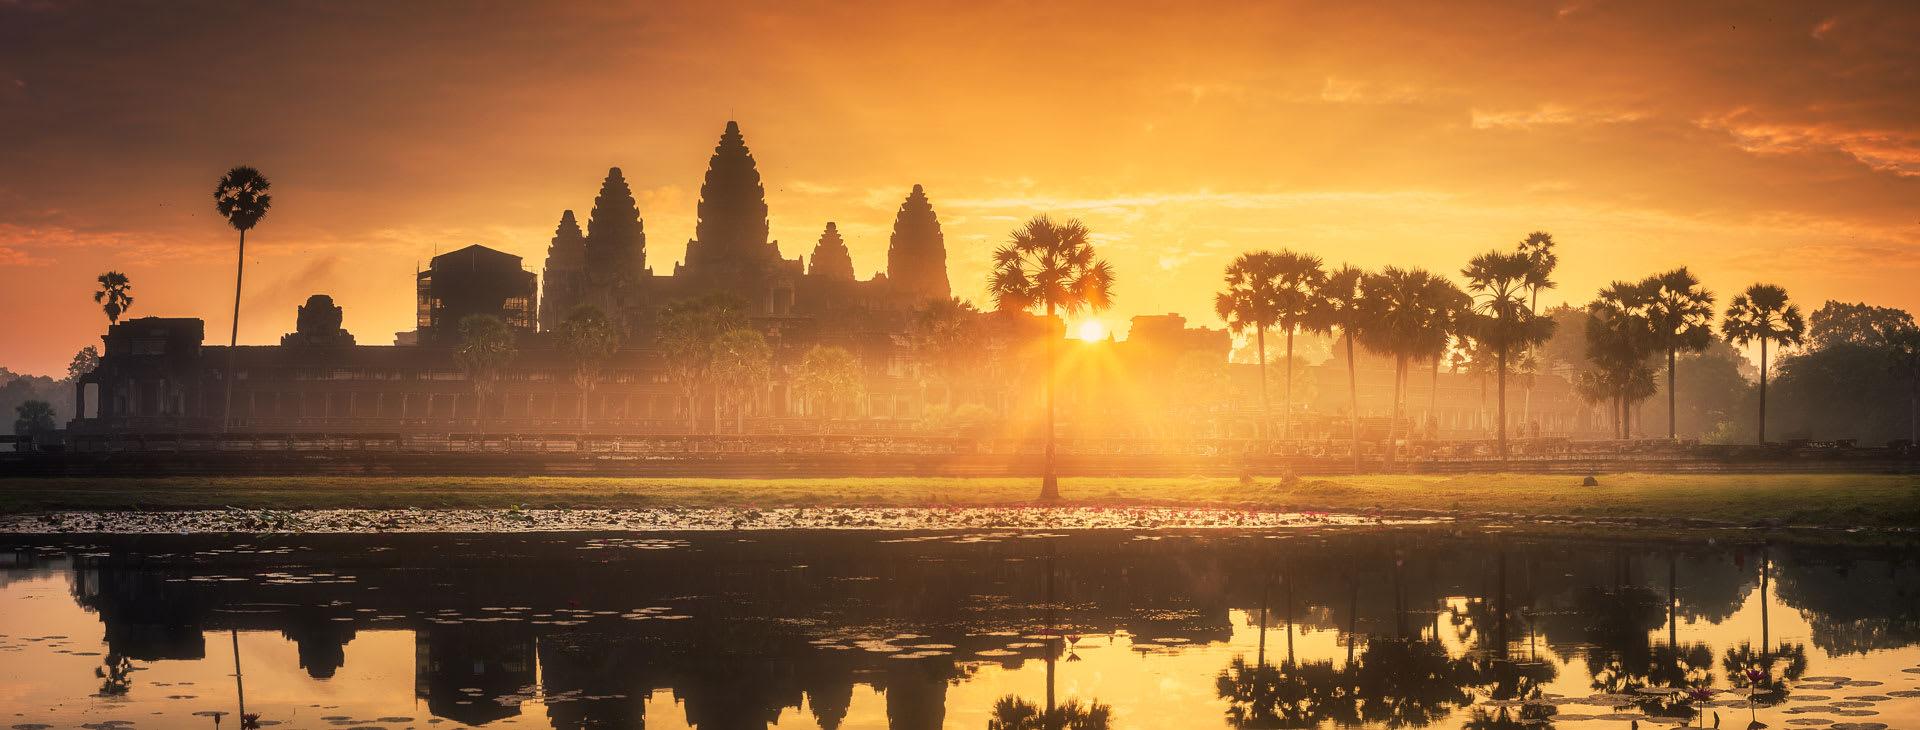 Angkor Wat in the sunrise light